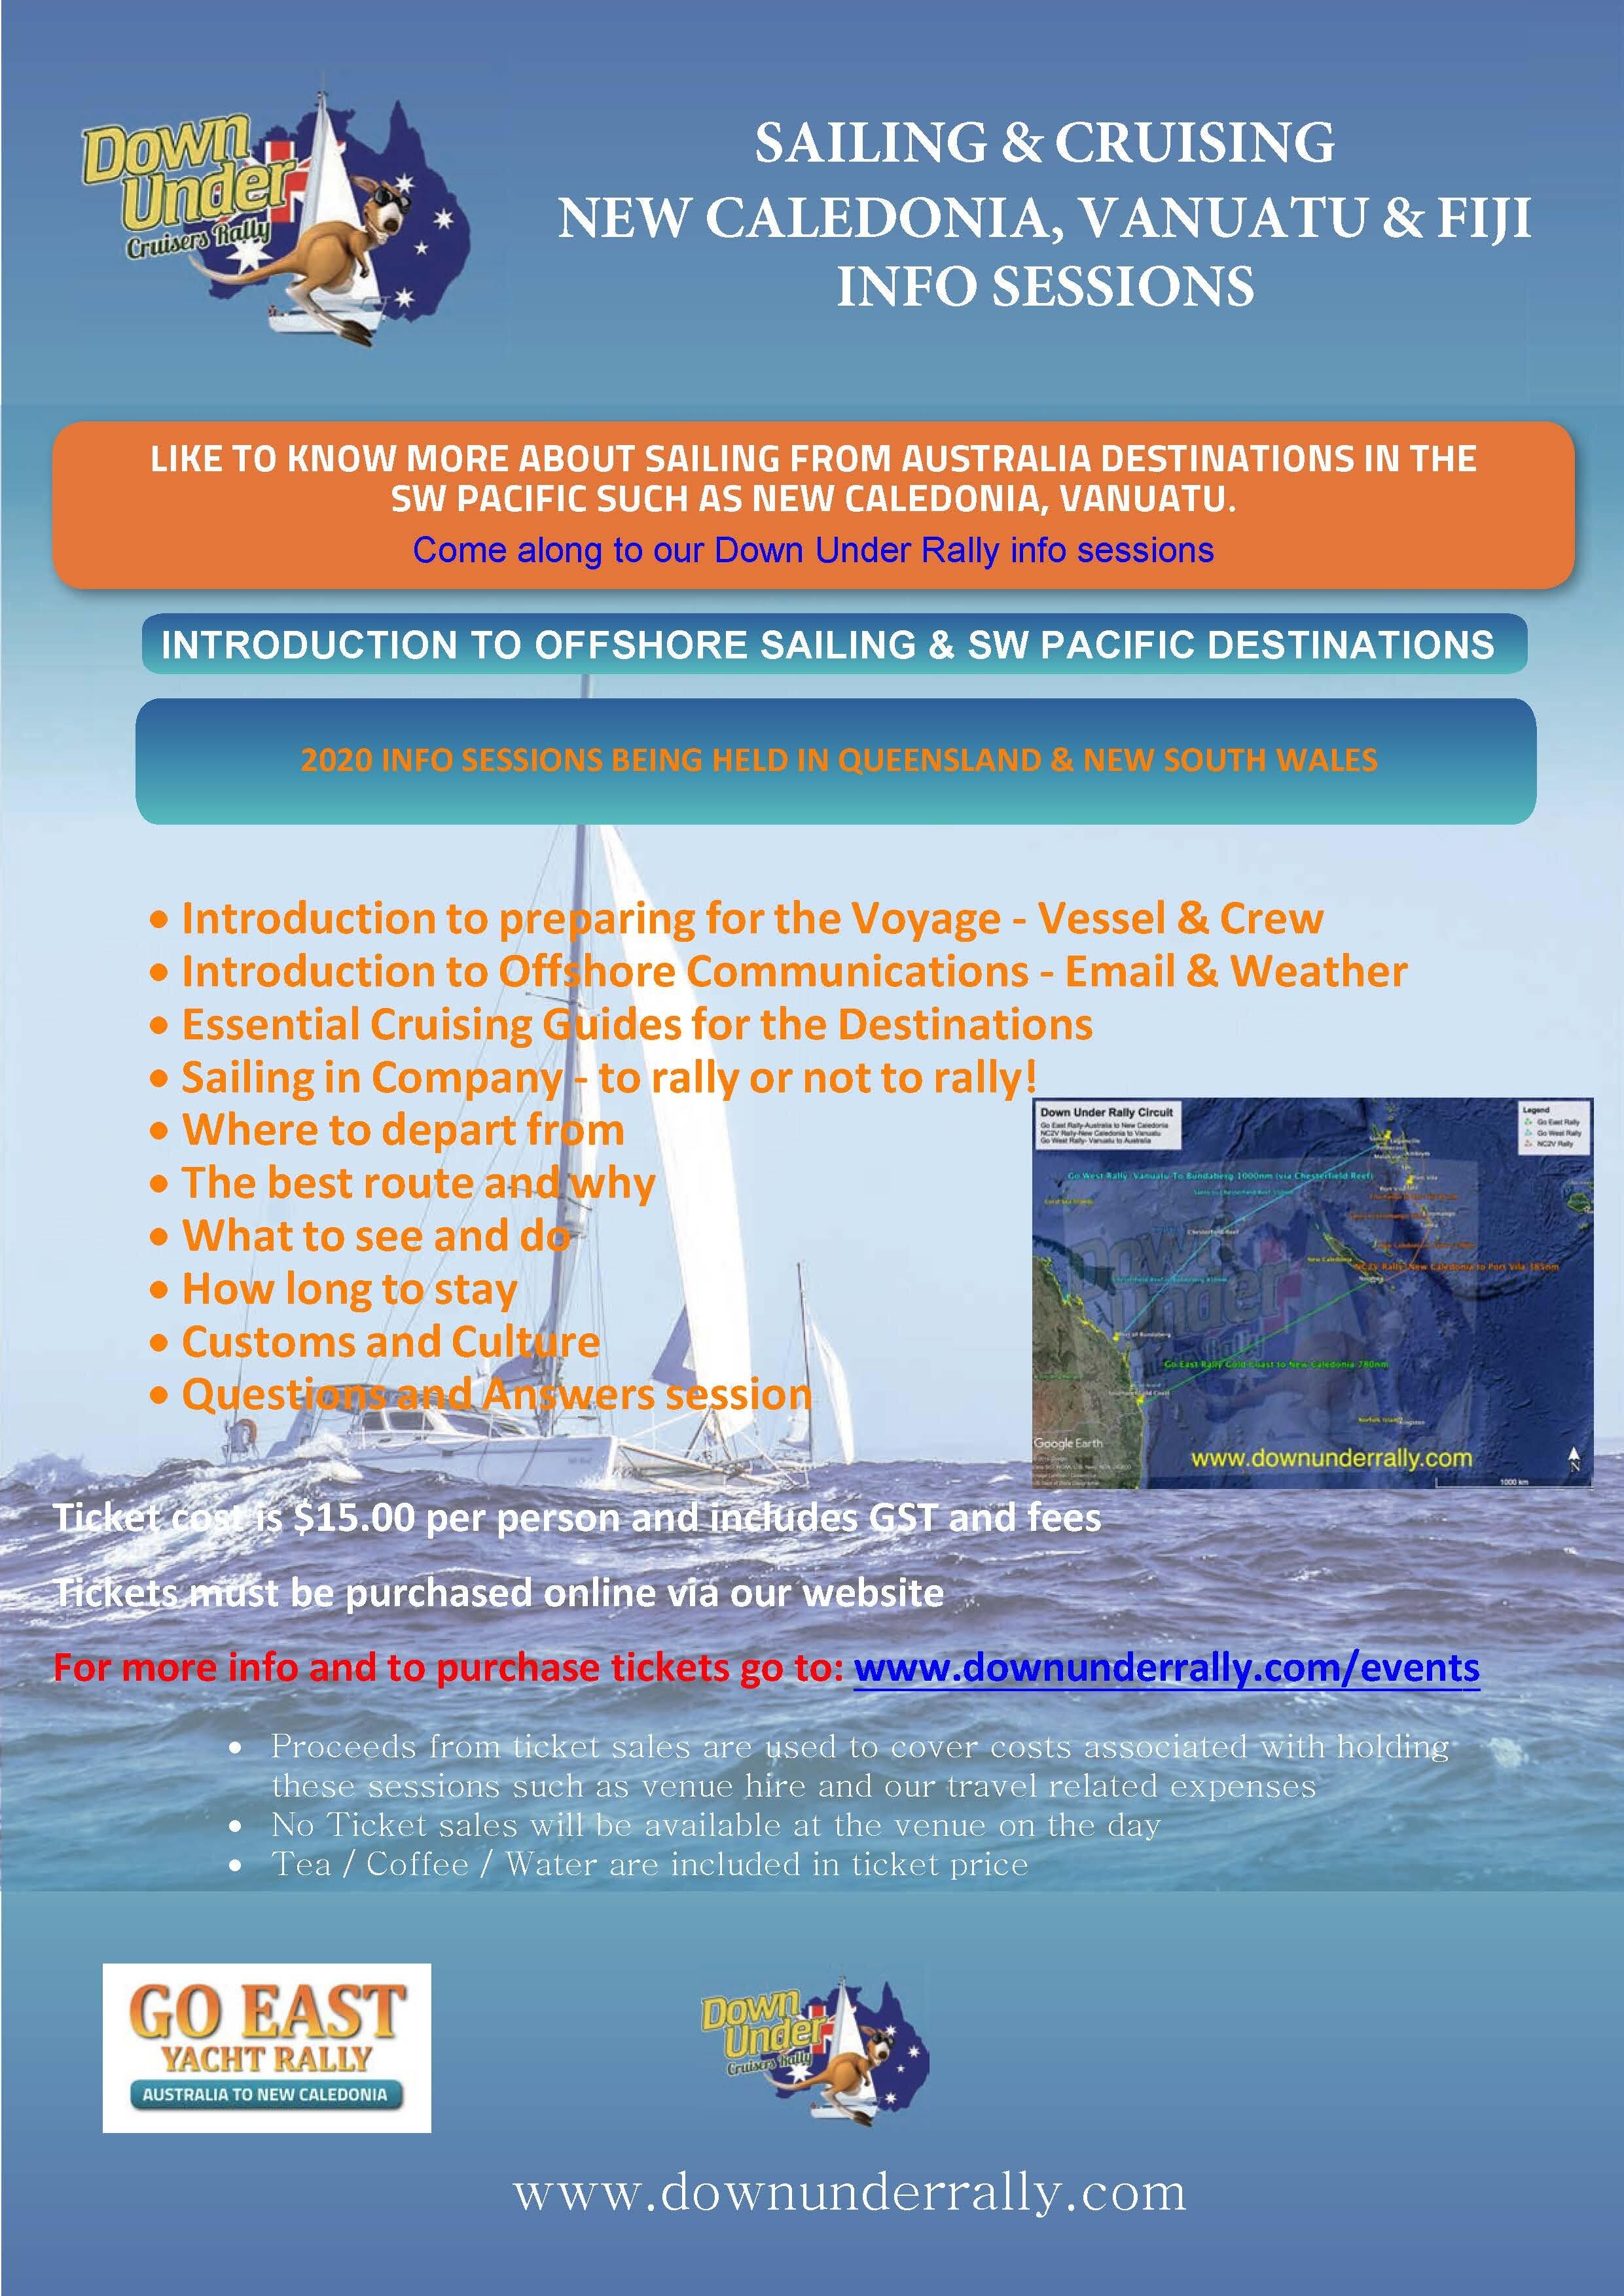 Sail New Caledonia & Vanuatu info session 2020_RFS.jpg